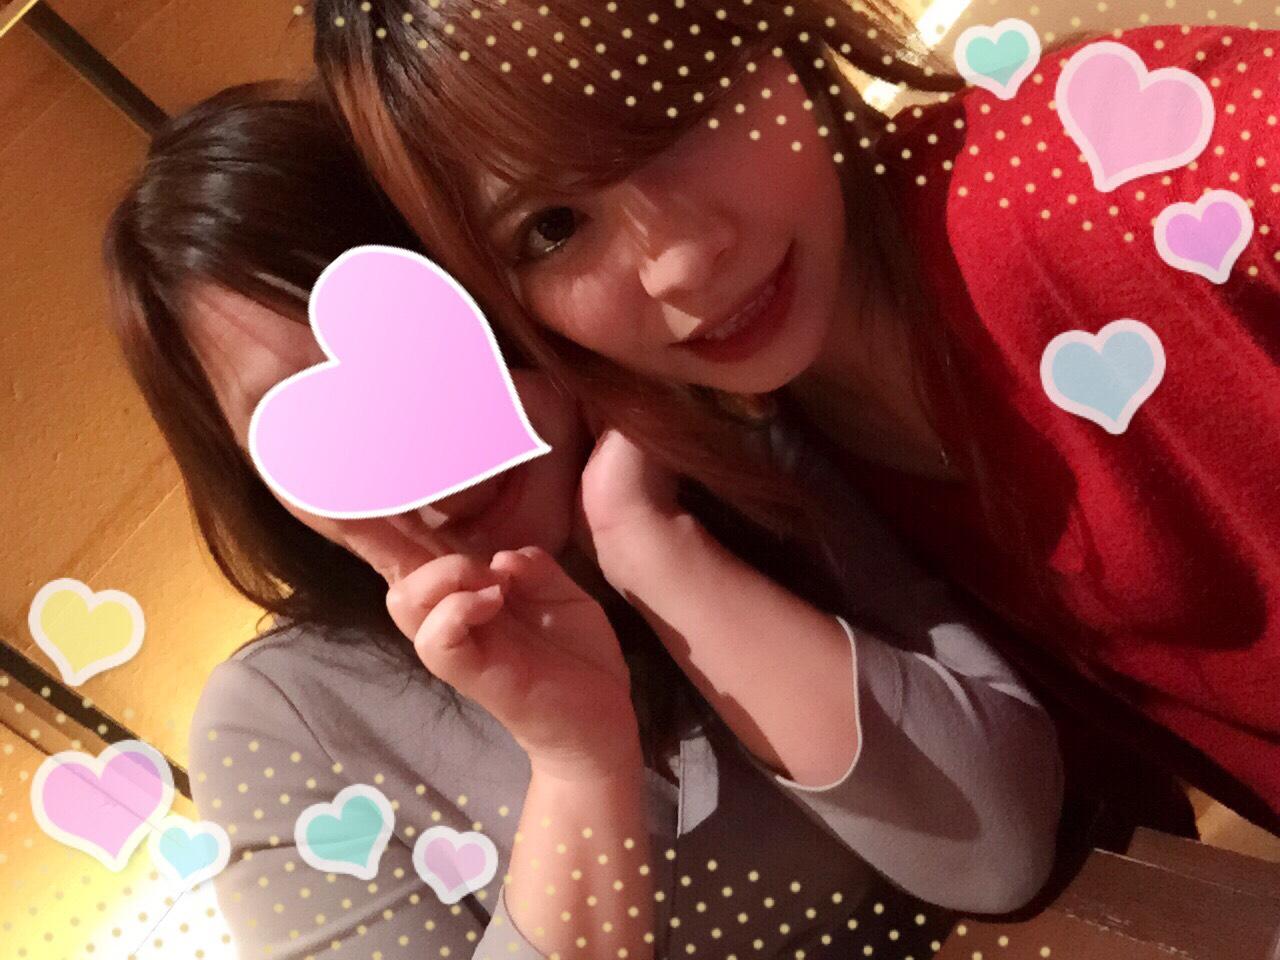 S__7086089.jpg